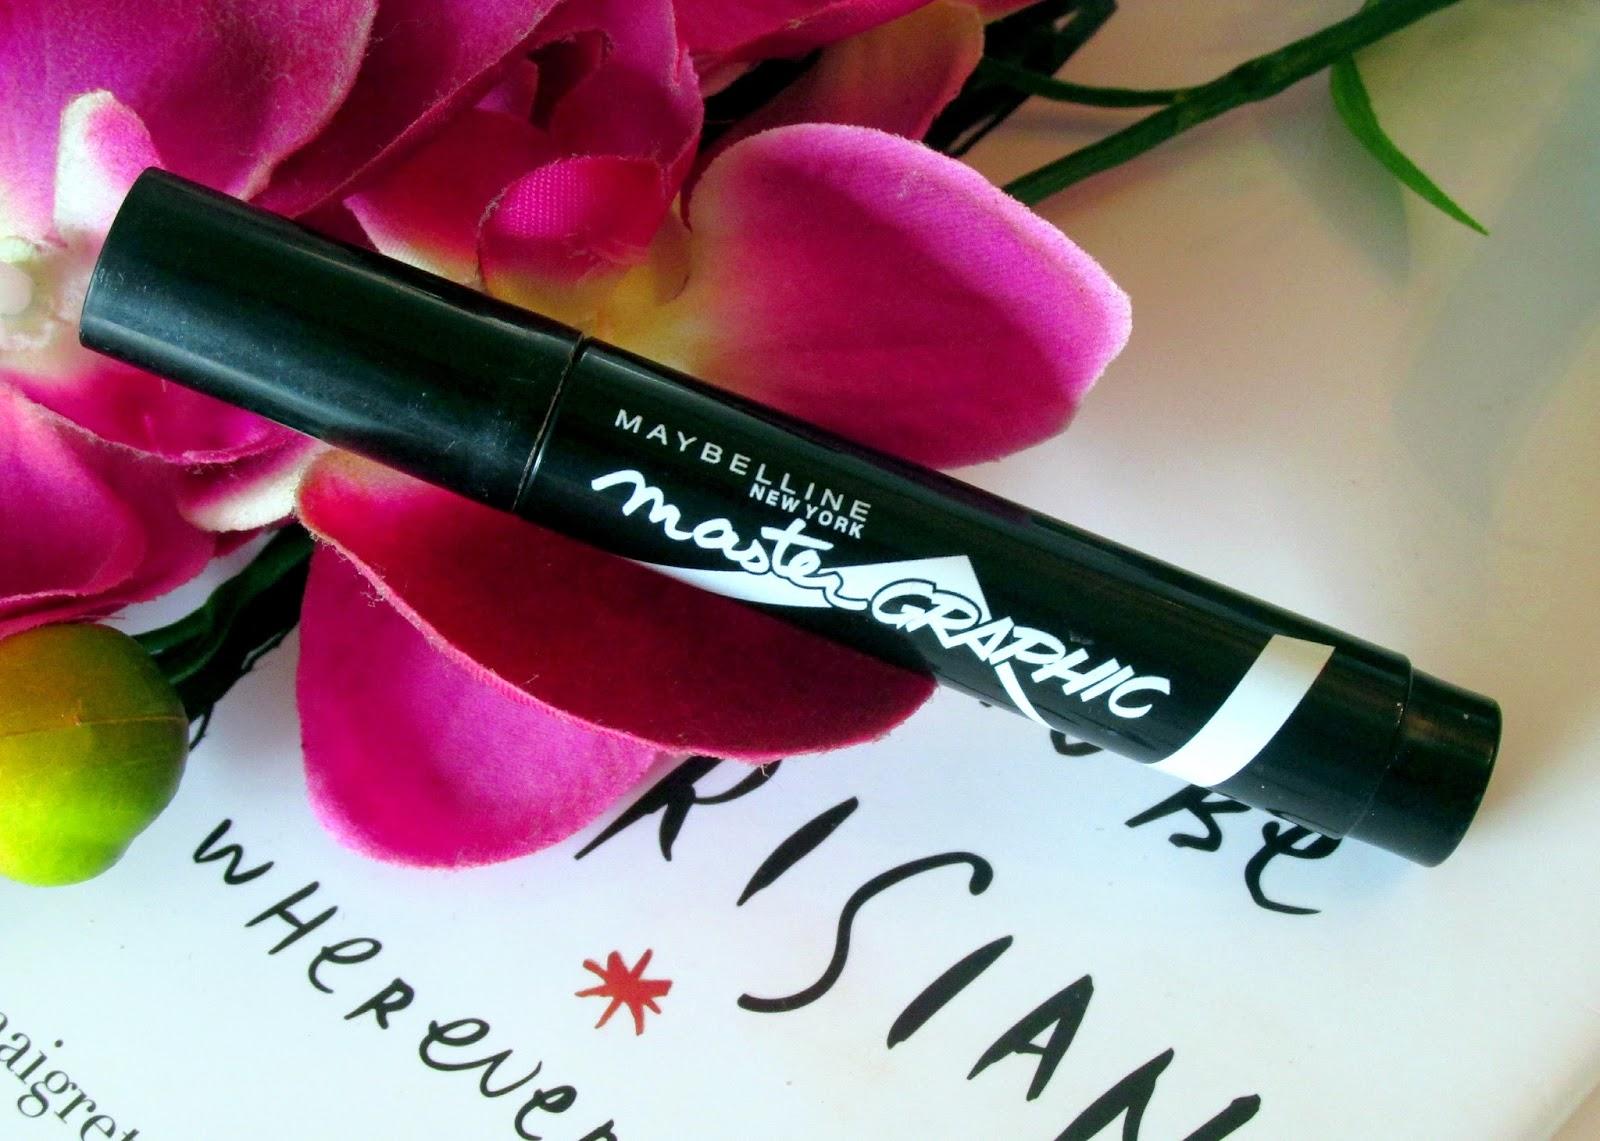 Maybelline Master Graphic Eyeliner